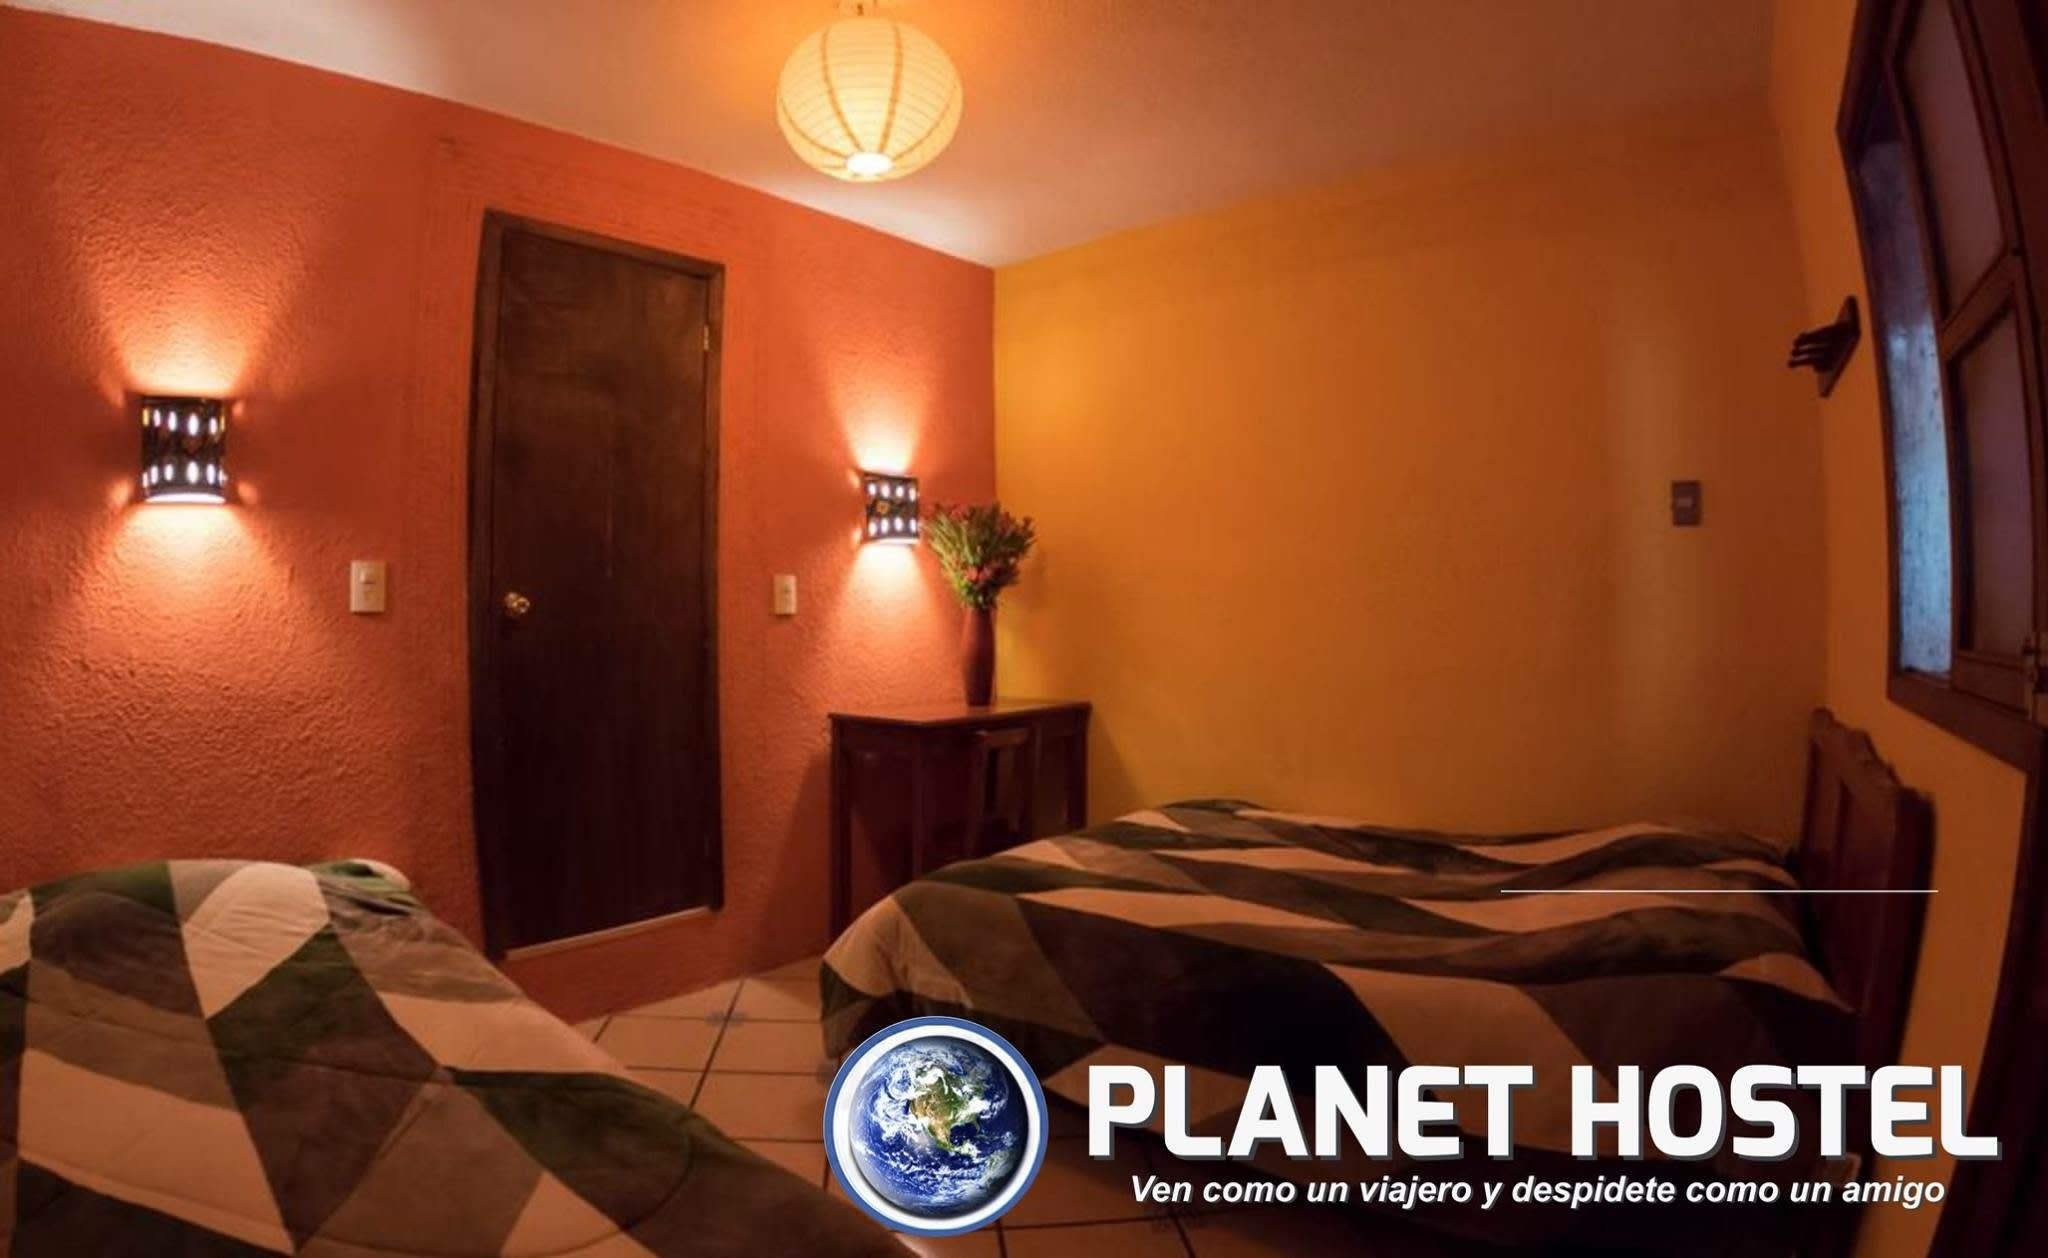 Planet Hostel